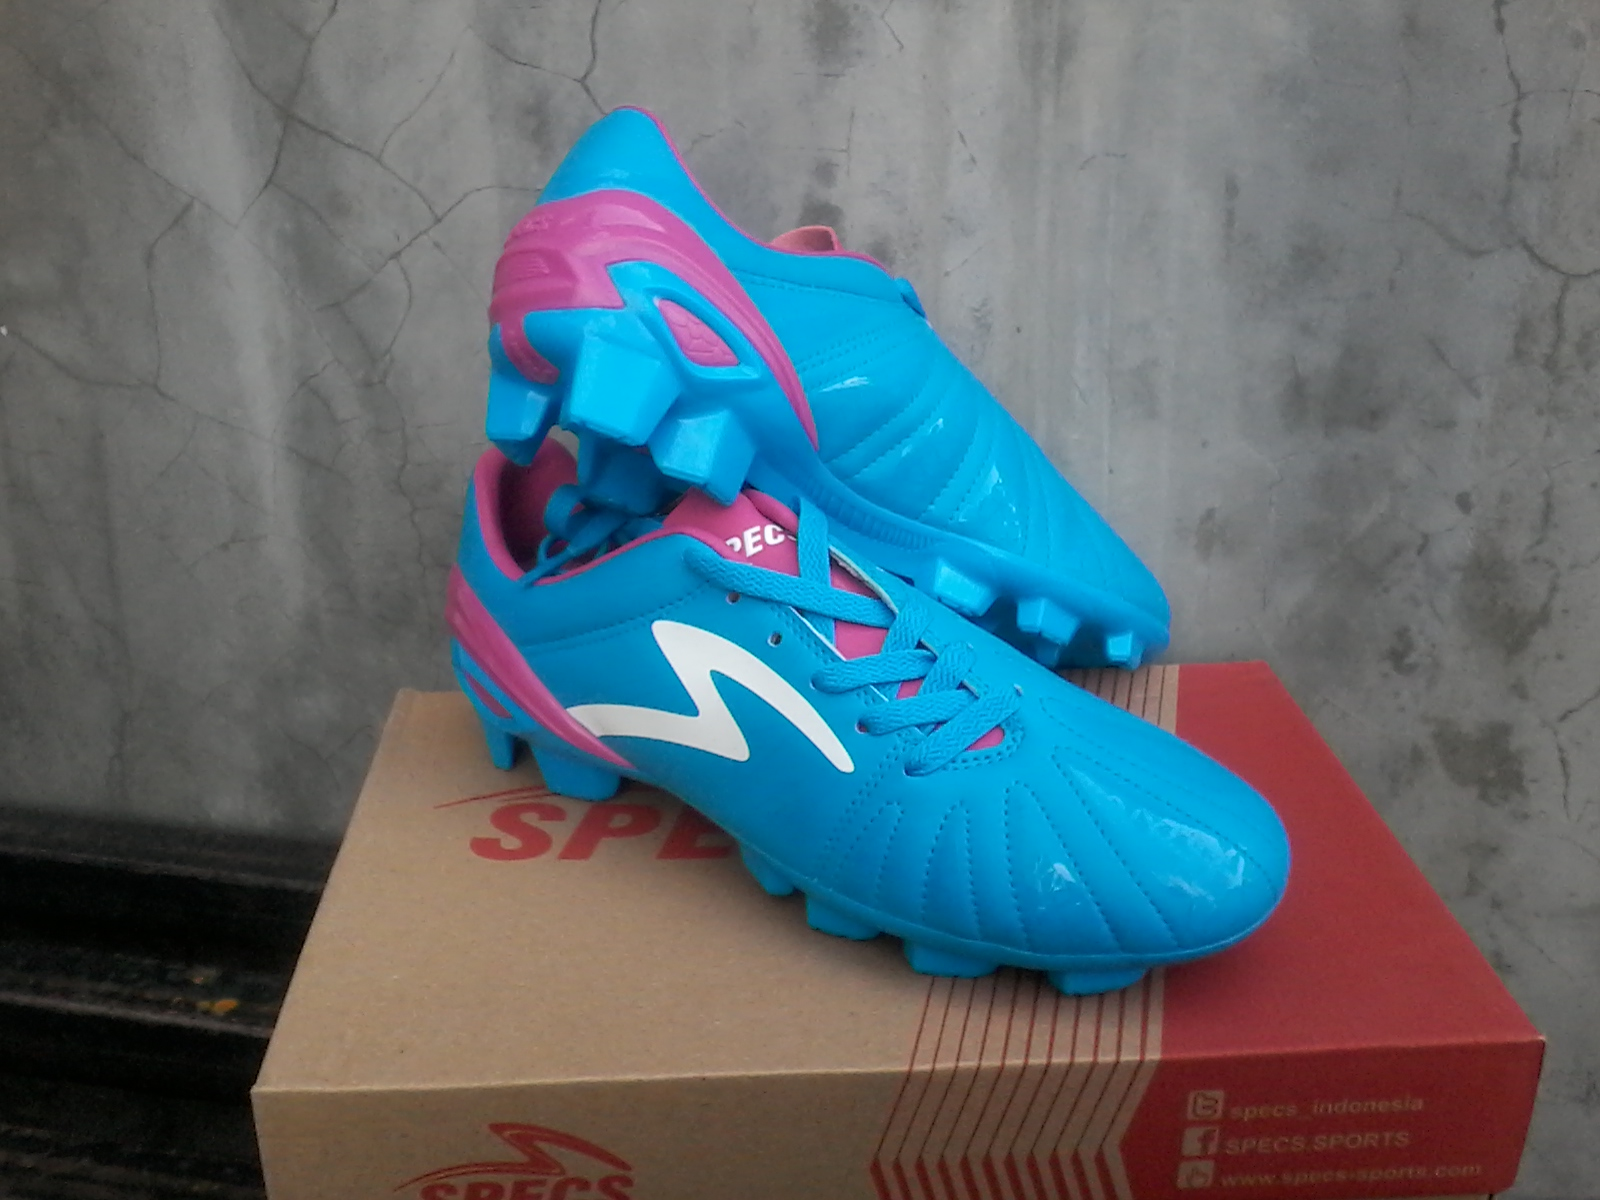 Sepatu Bola Specs Tomahawk Fg Blue Pink Toko Original Anti Kw